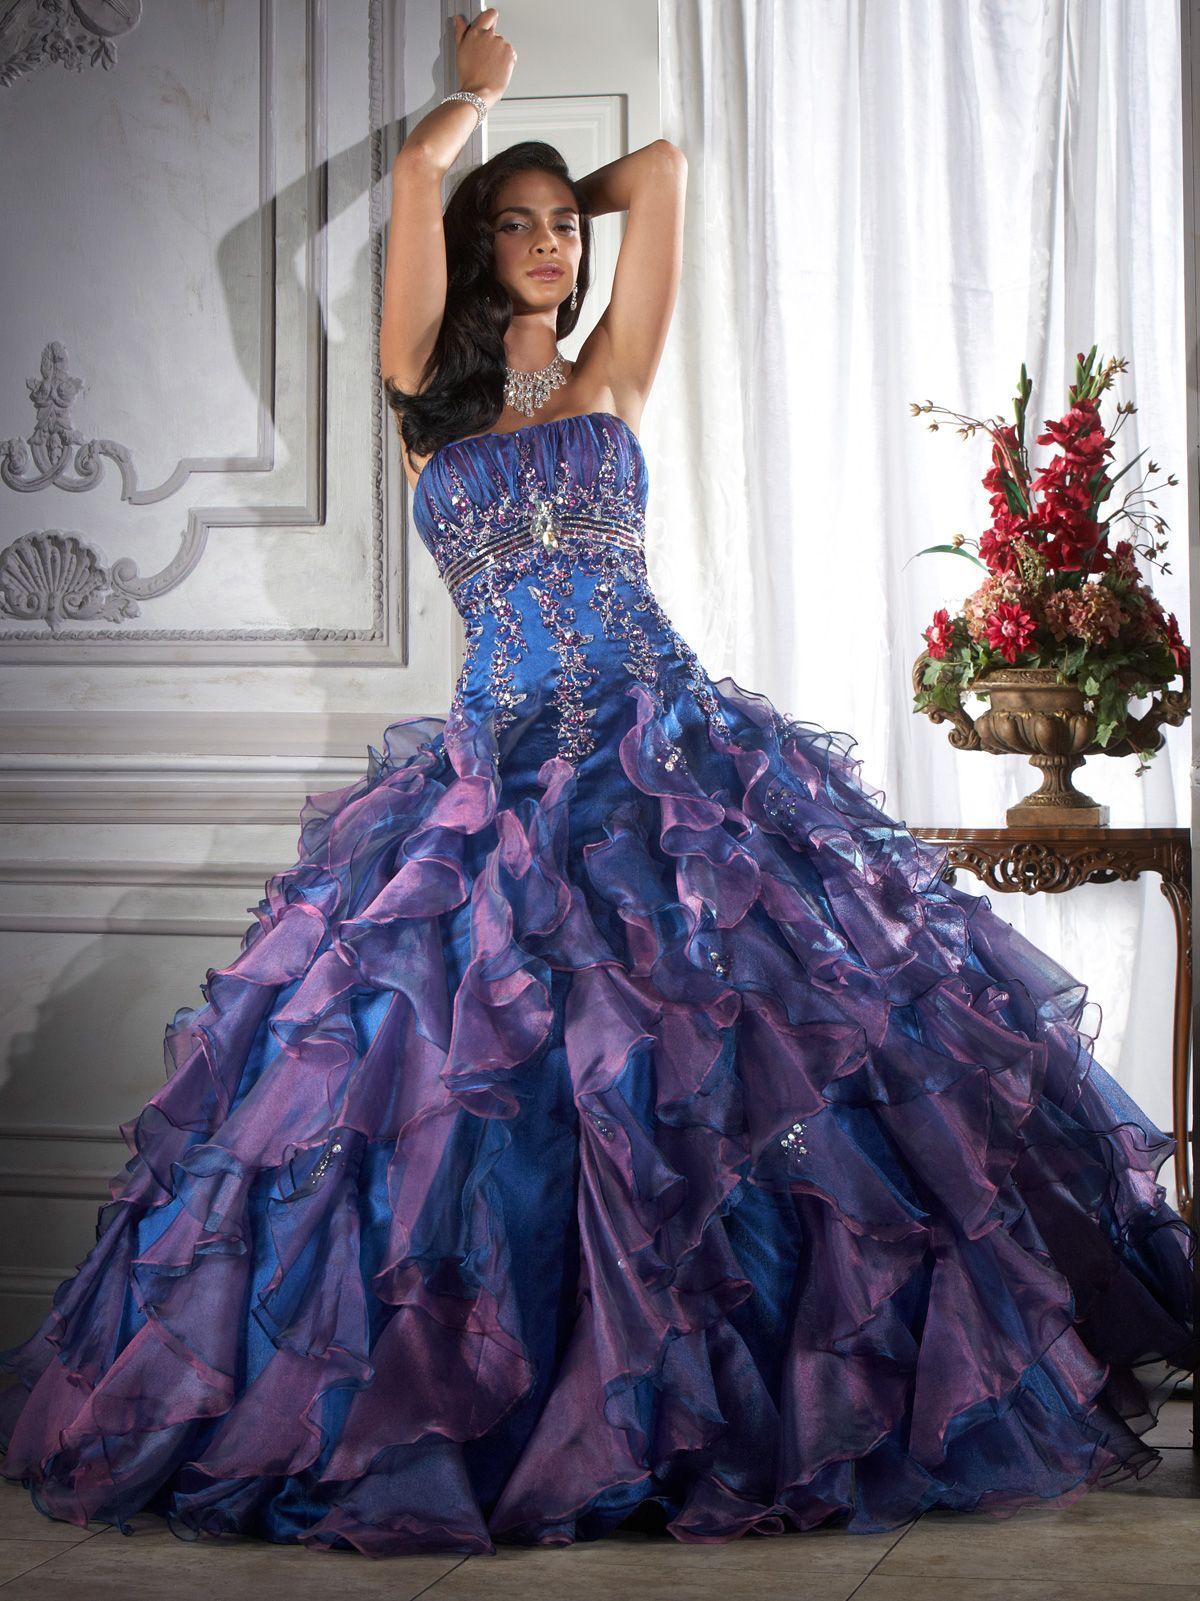 Small Crop Of Purple Wedding Dress